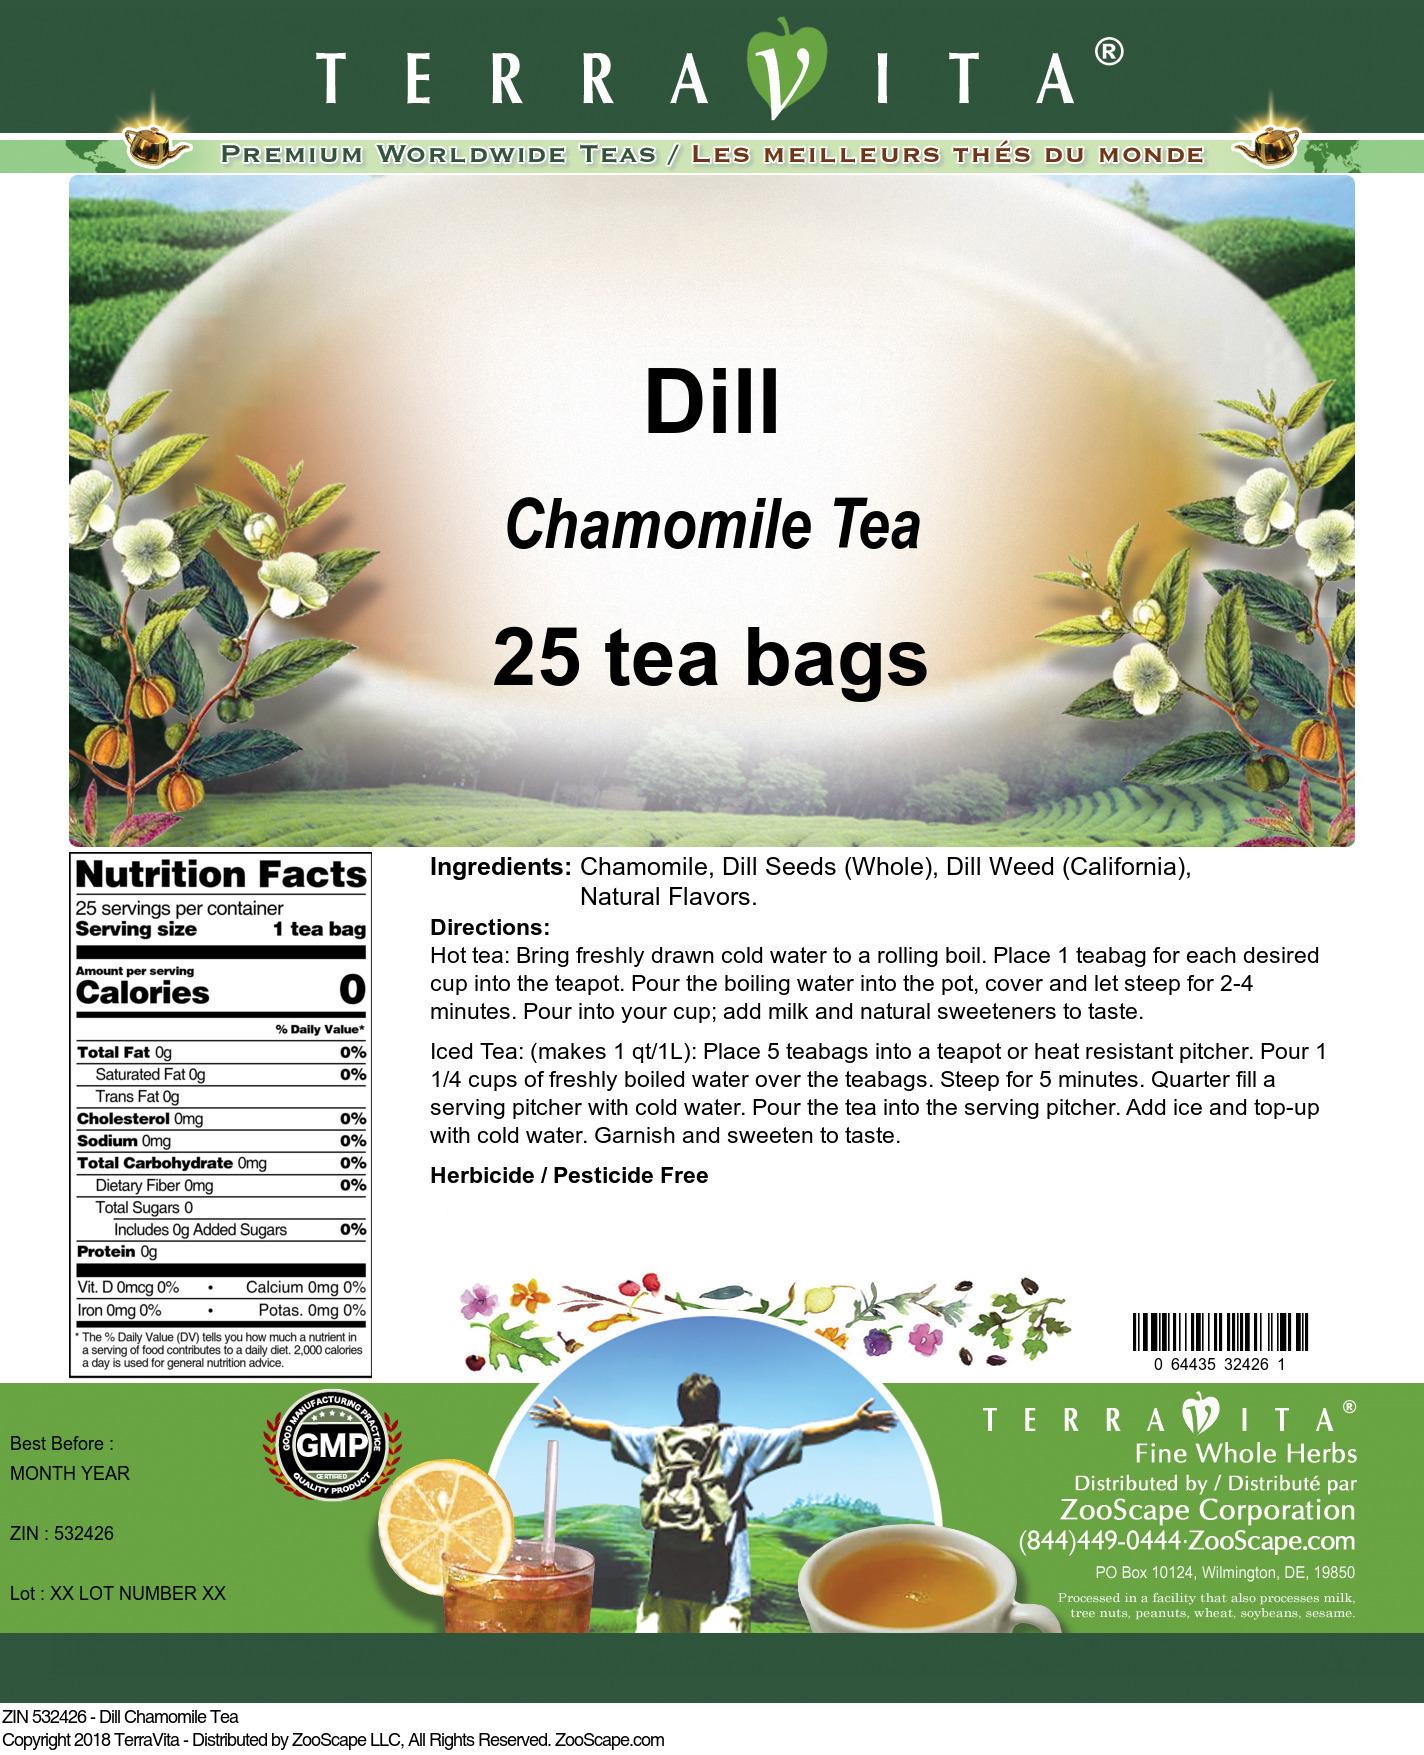 Dill Chamomile Tea